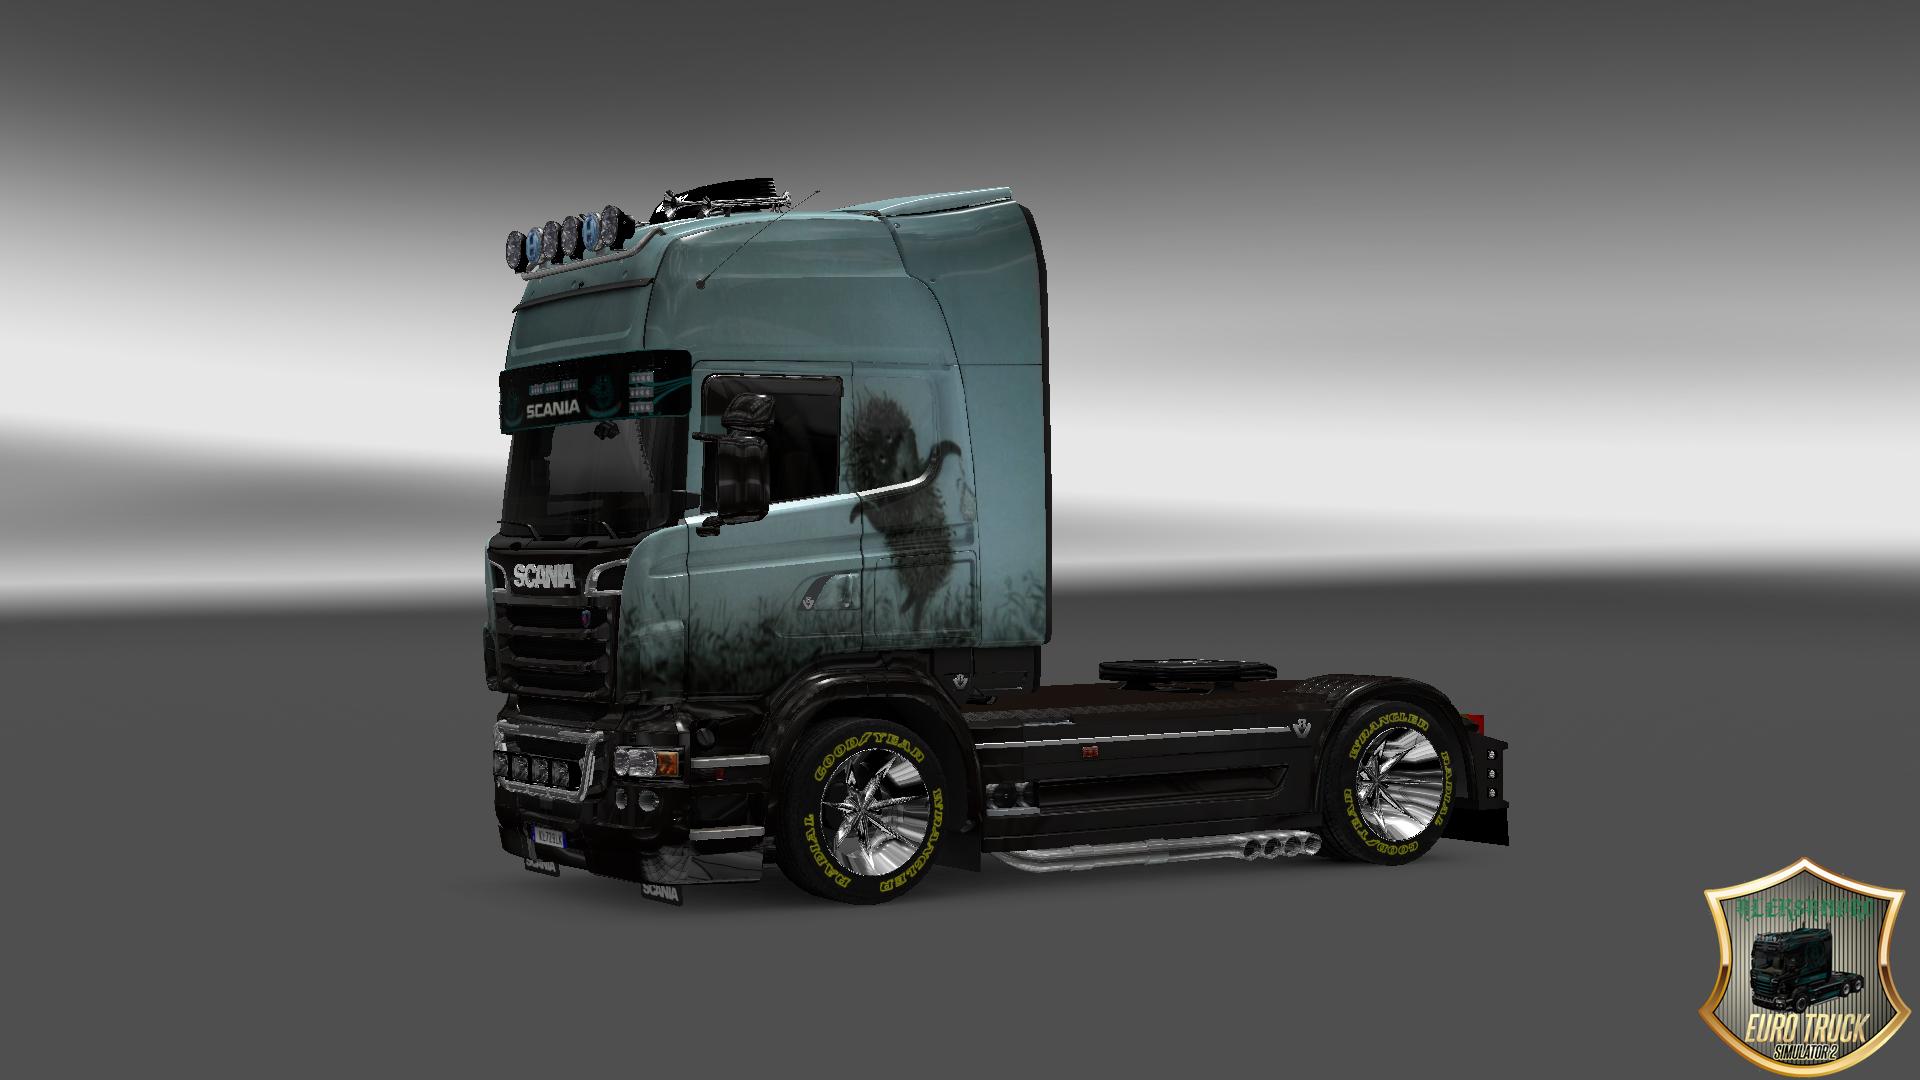 мод фредлайнер для euro truck simulator 2 скачать